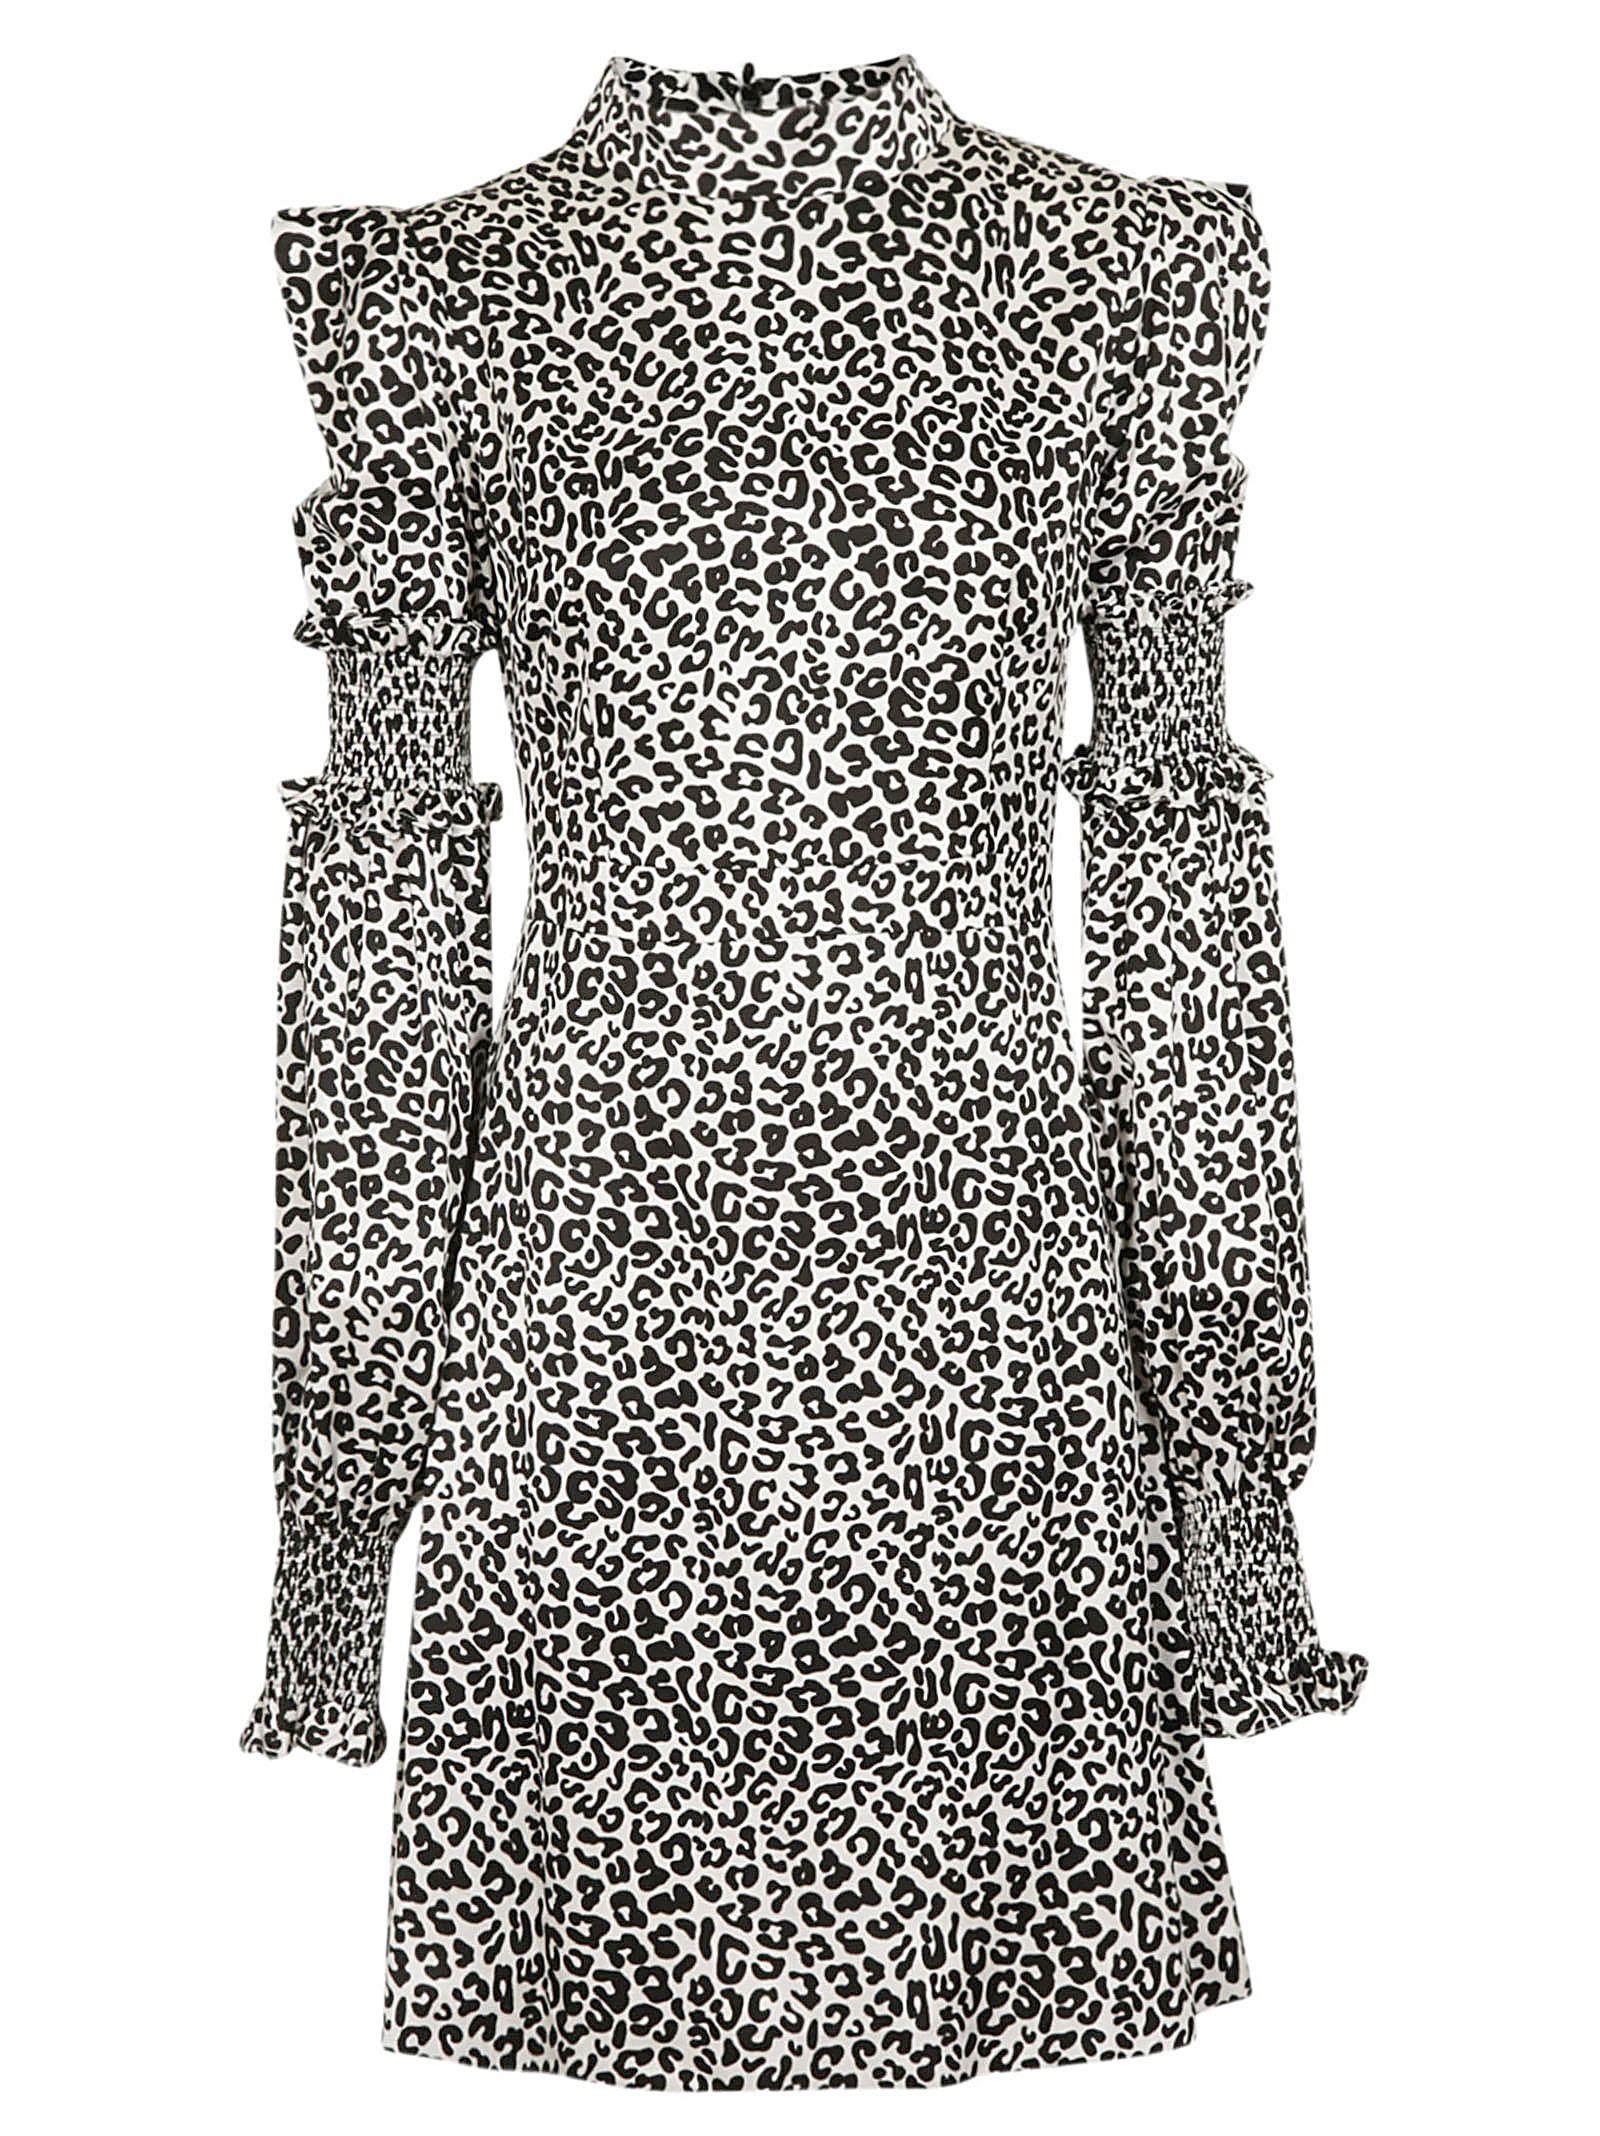 WANDERING Wandering Leopard Print Ruffle Sleeves Dress in Bianco/Nero